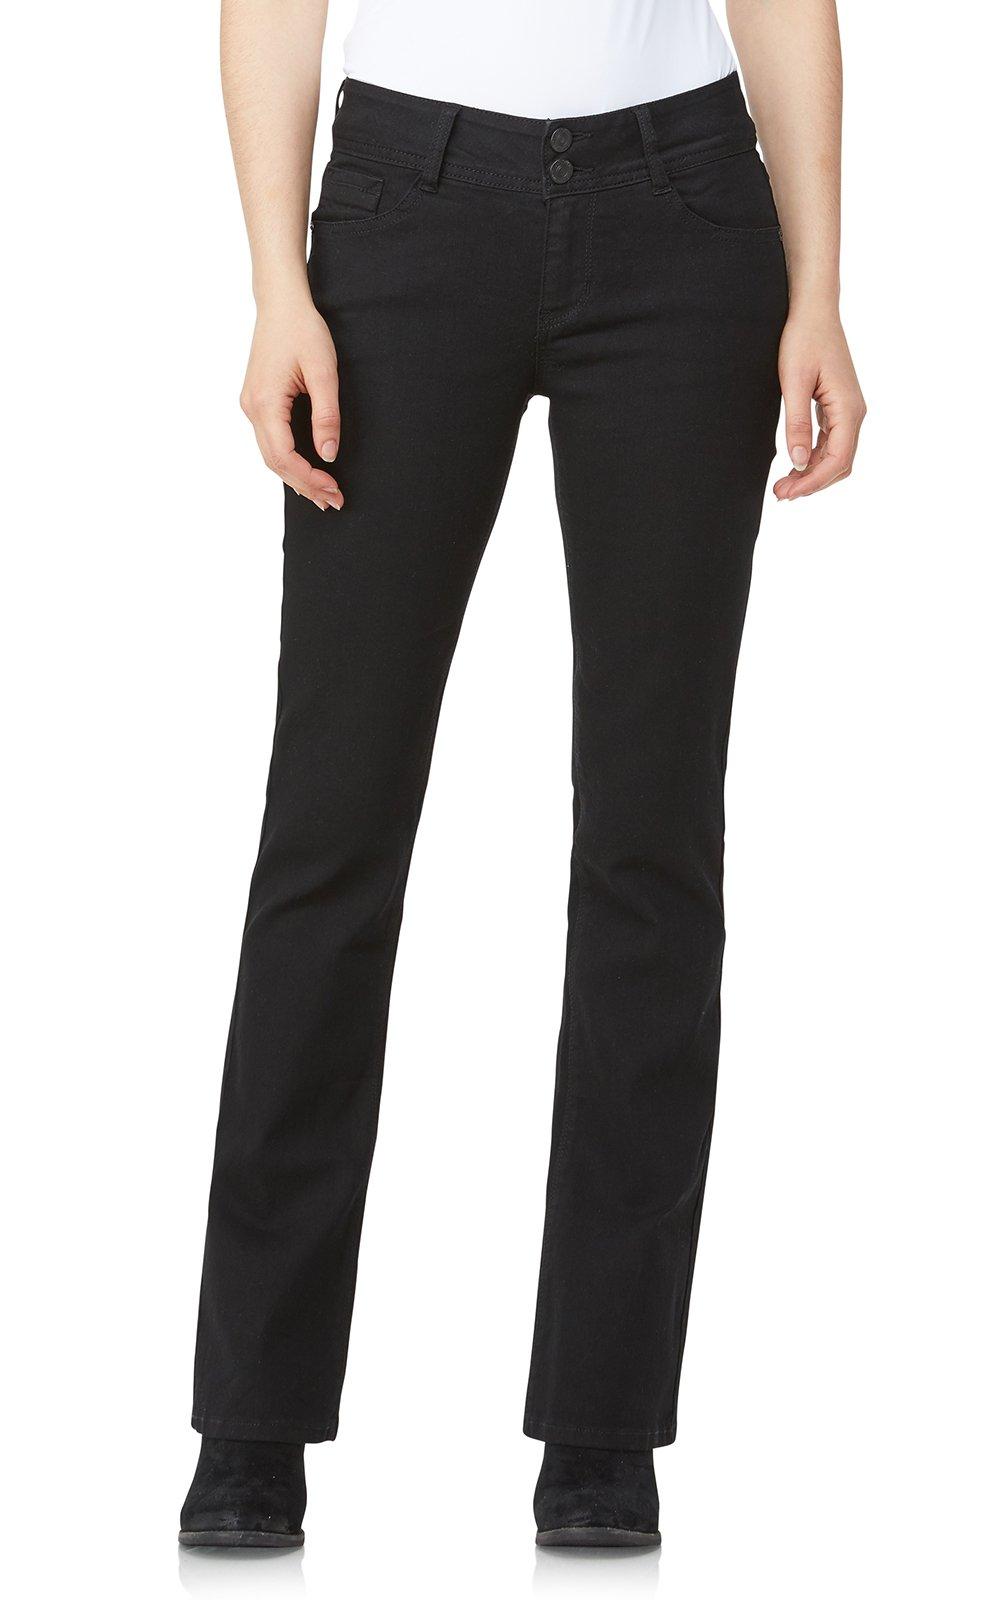 WallFlower Jeans Junior's Instastretch Luscious Curvy Bootcut Jeans, Black, 7 by WallFlower